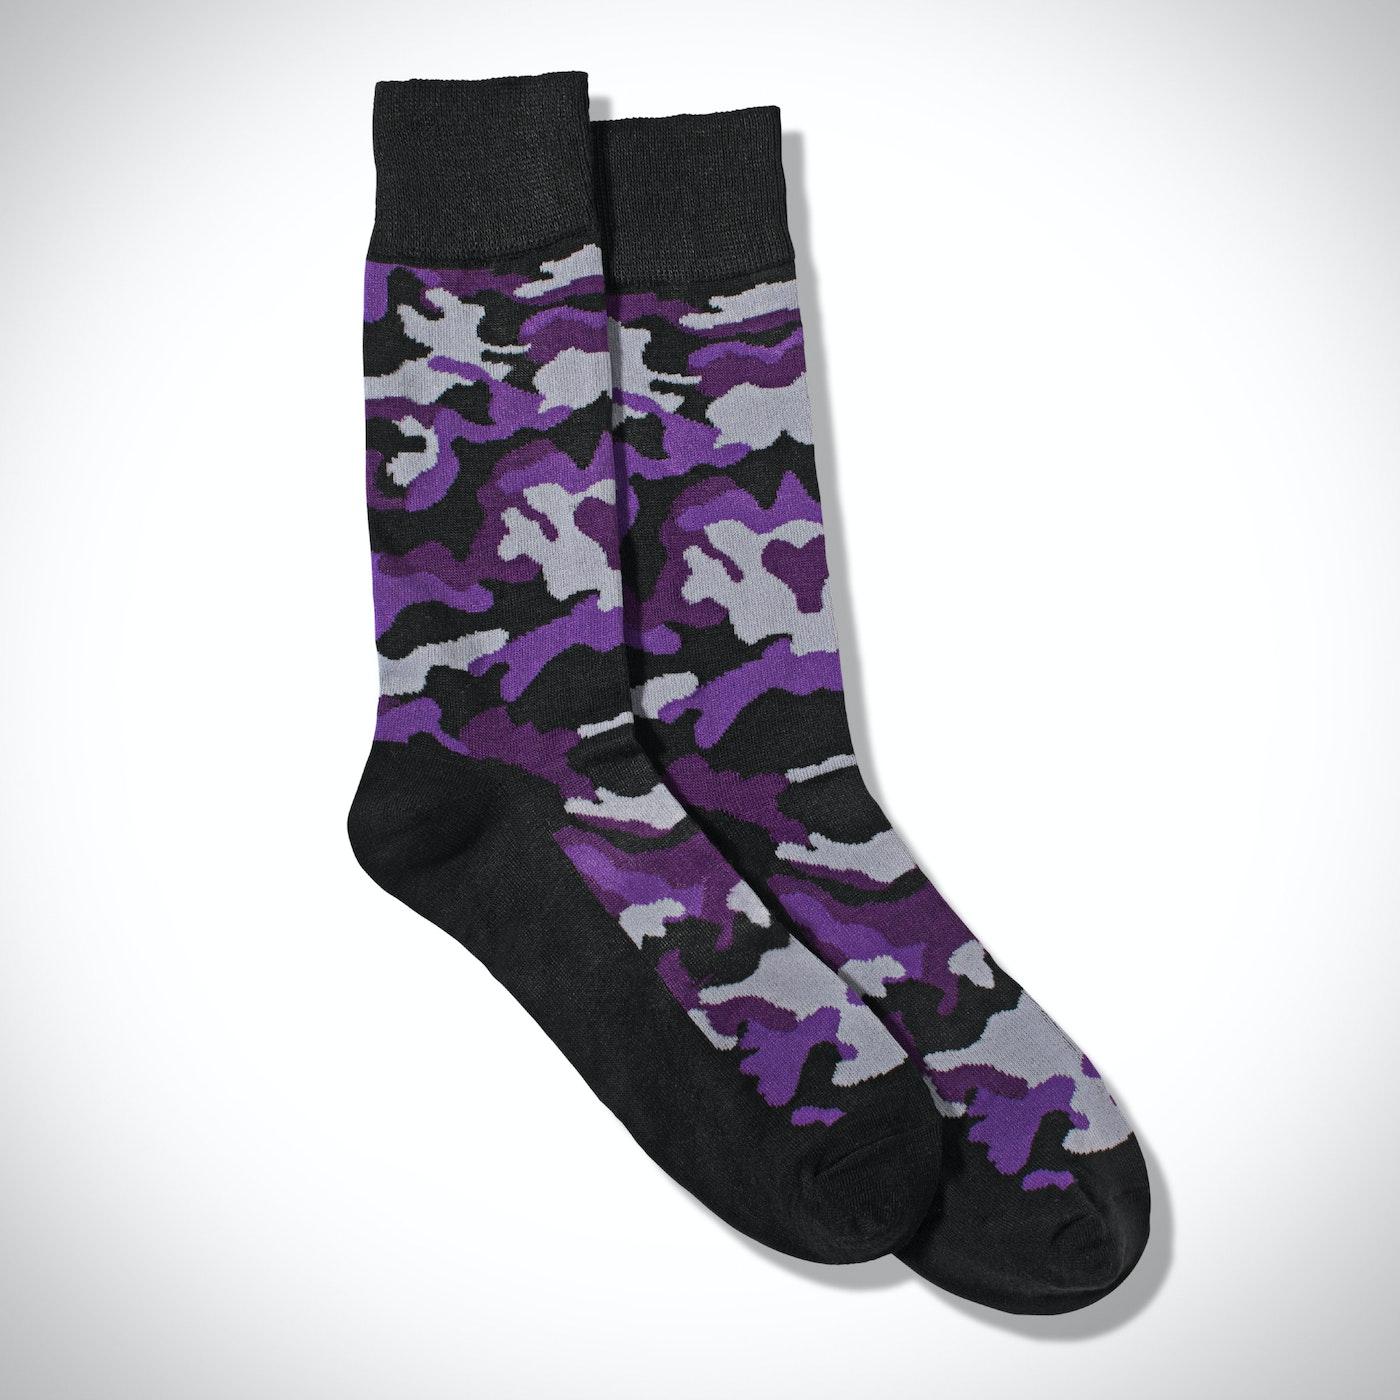 Royal Purple Camo Print Socks